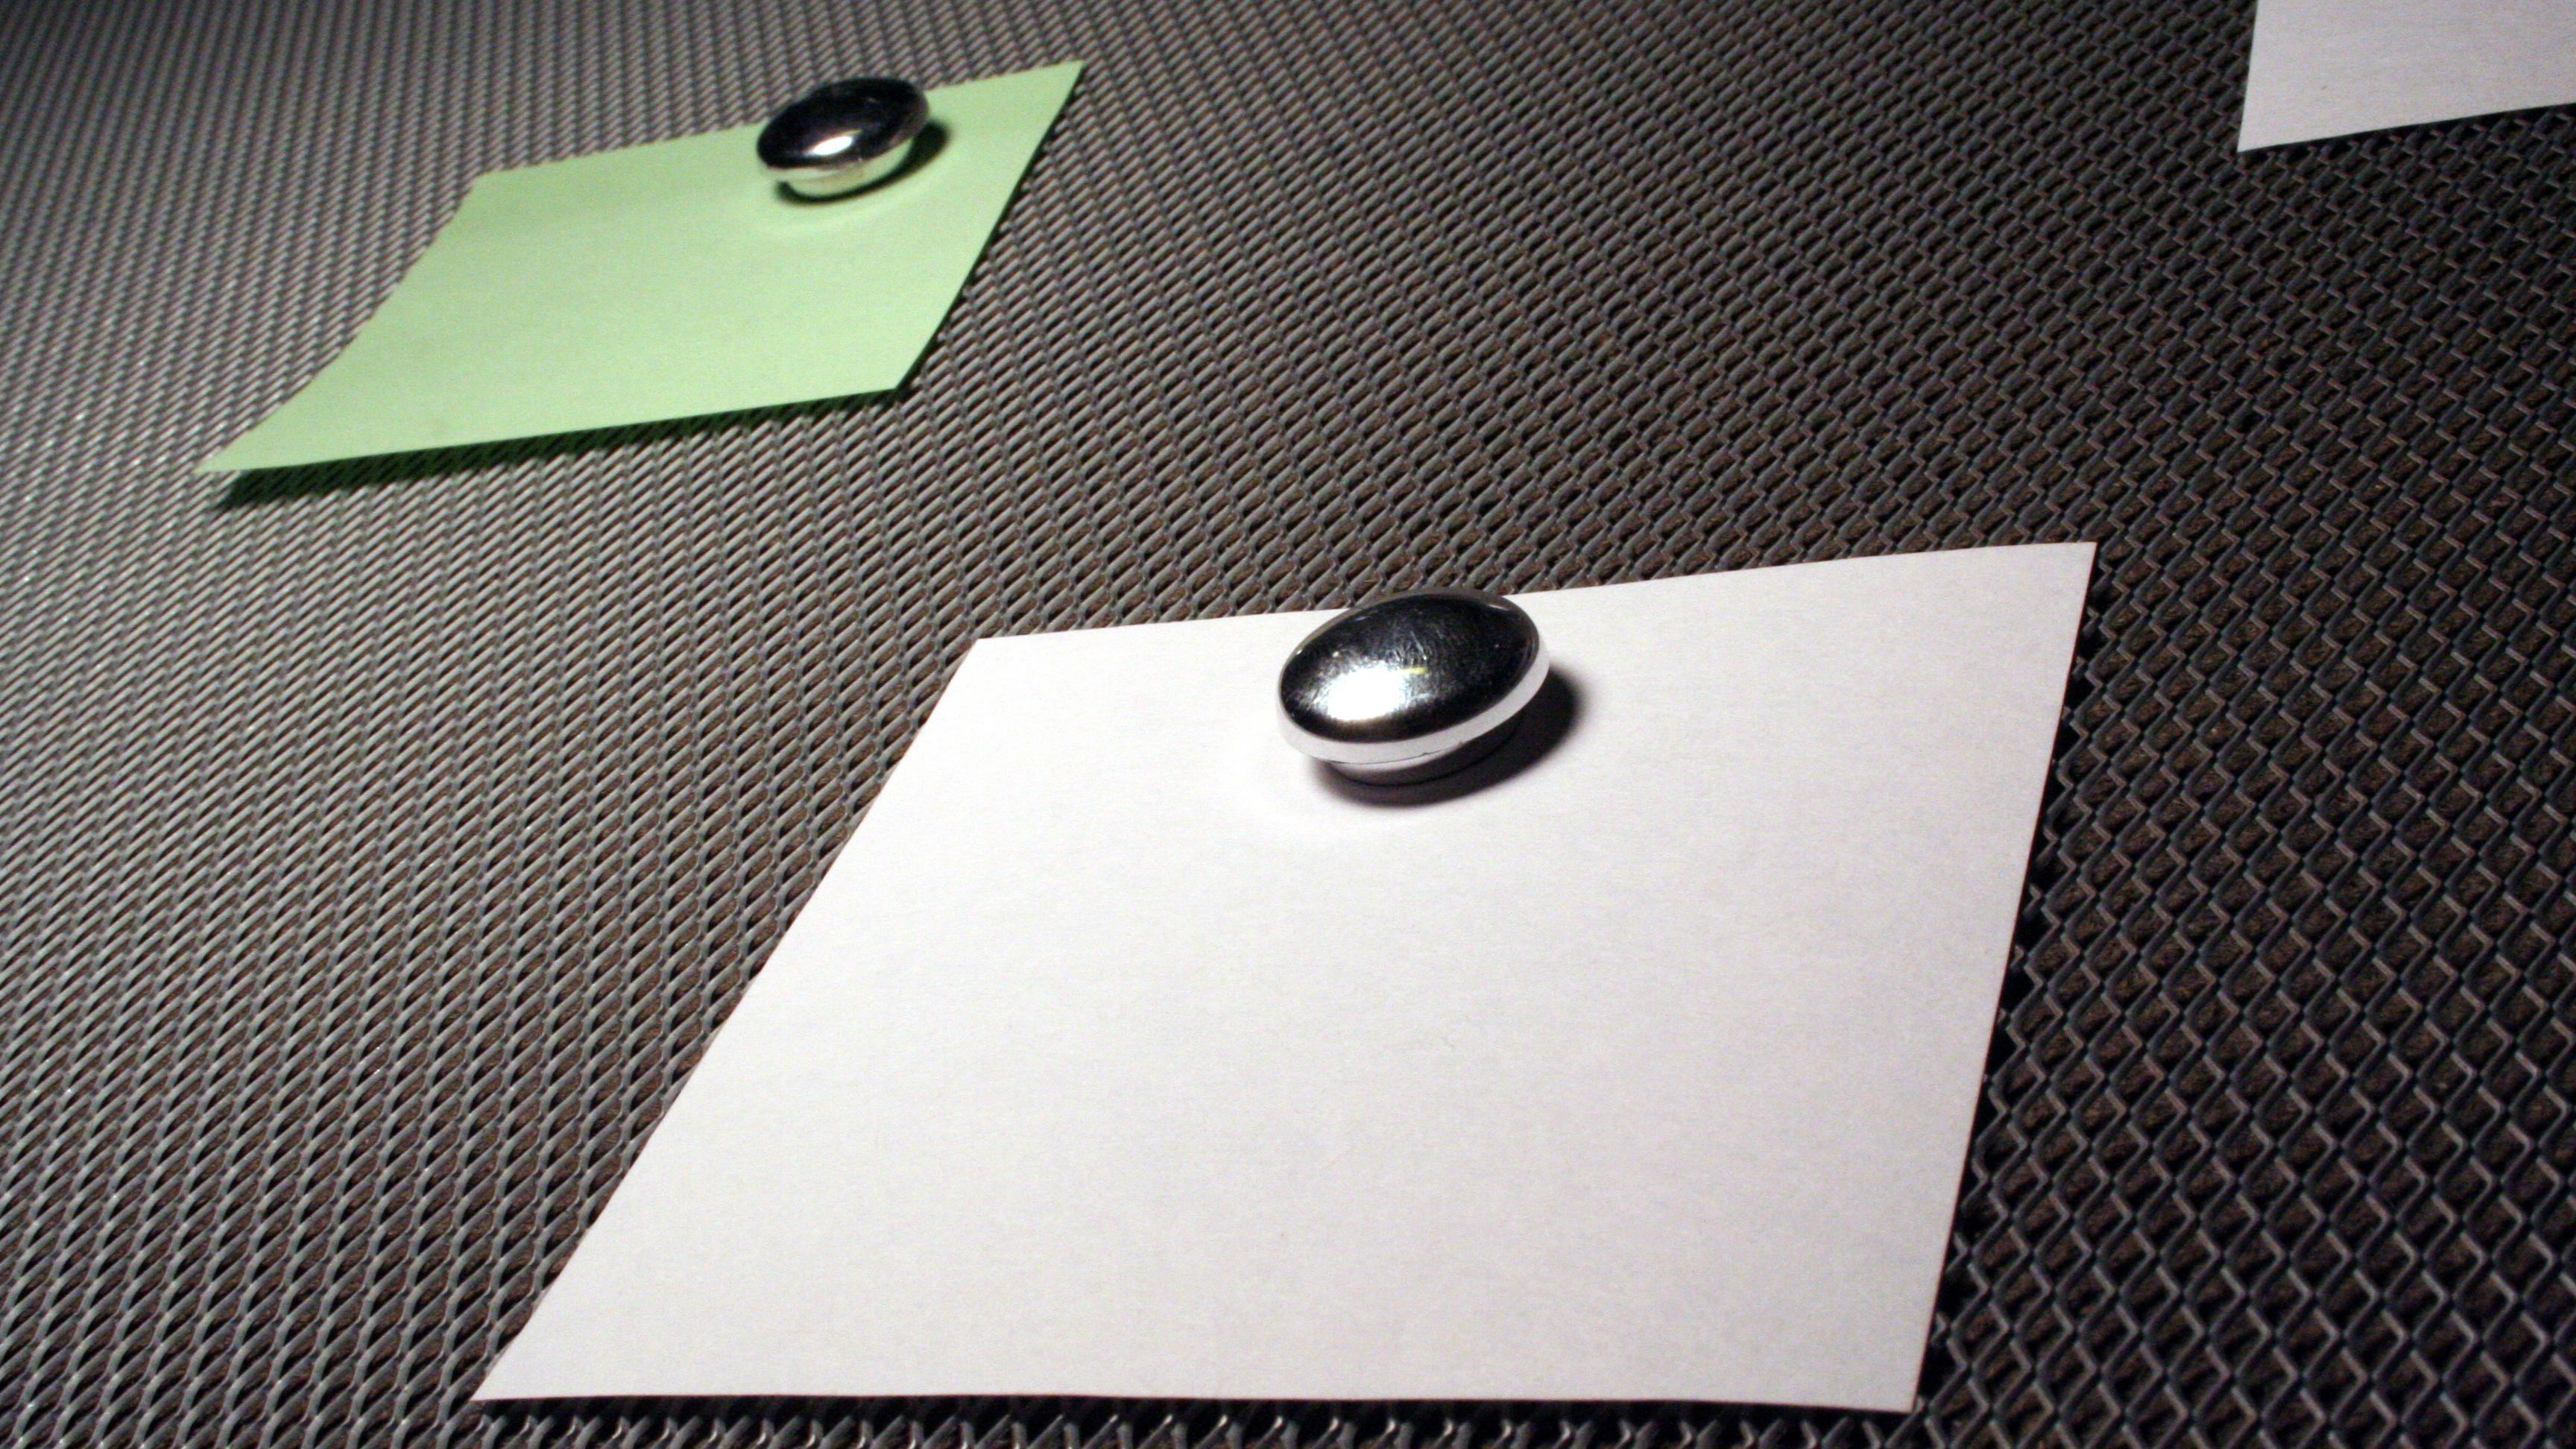 Magnetwand selber machen: So geht's